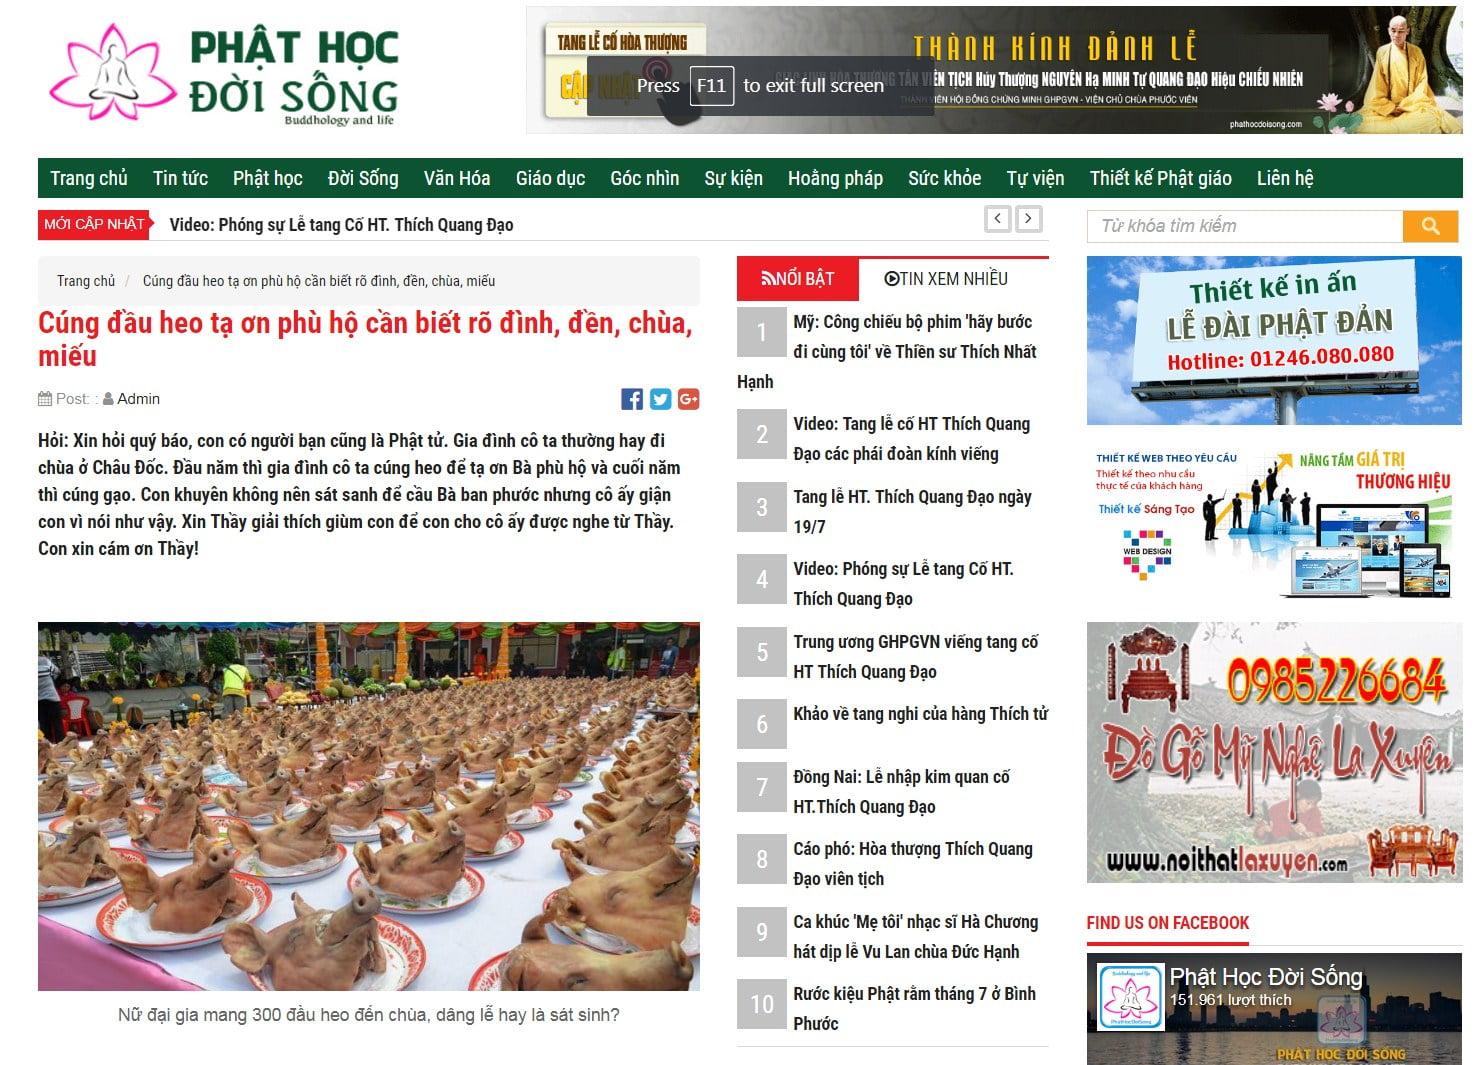 Phan hoi cua bao Phat Hoc Doi Song - minh chung 1